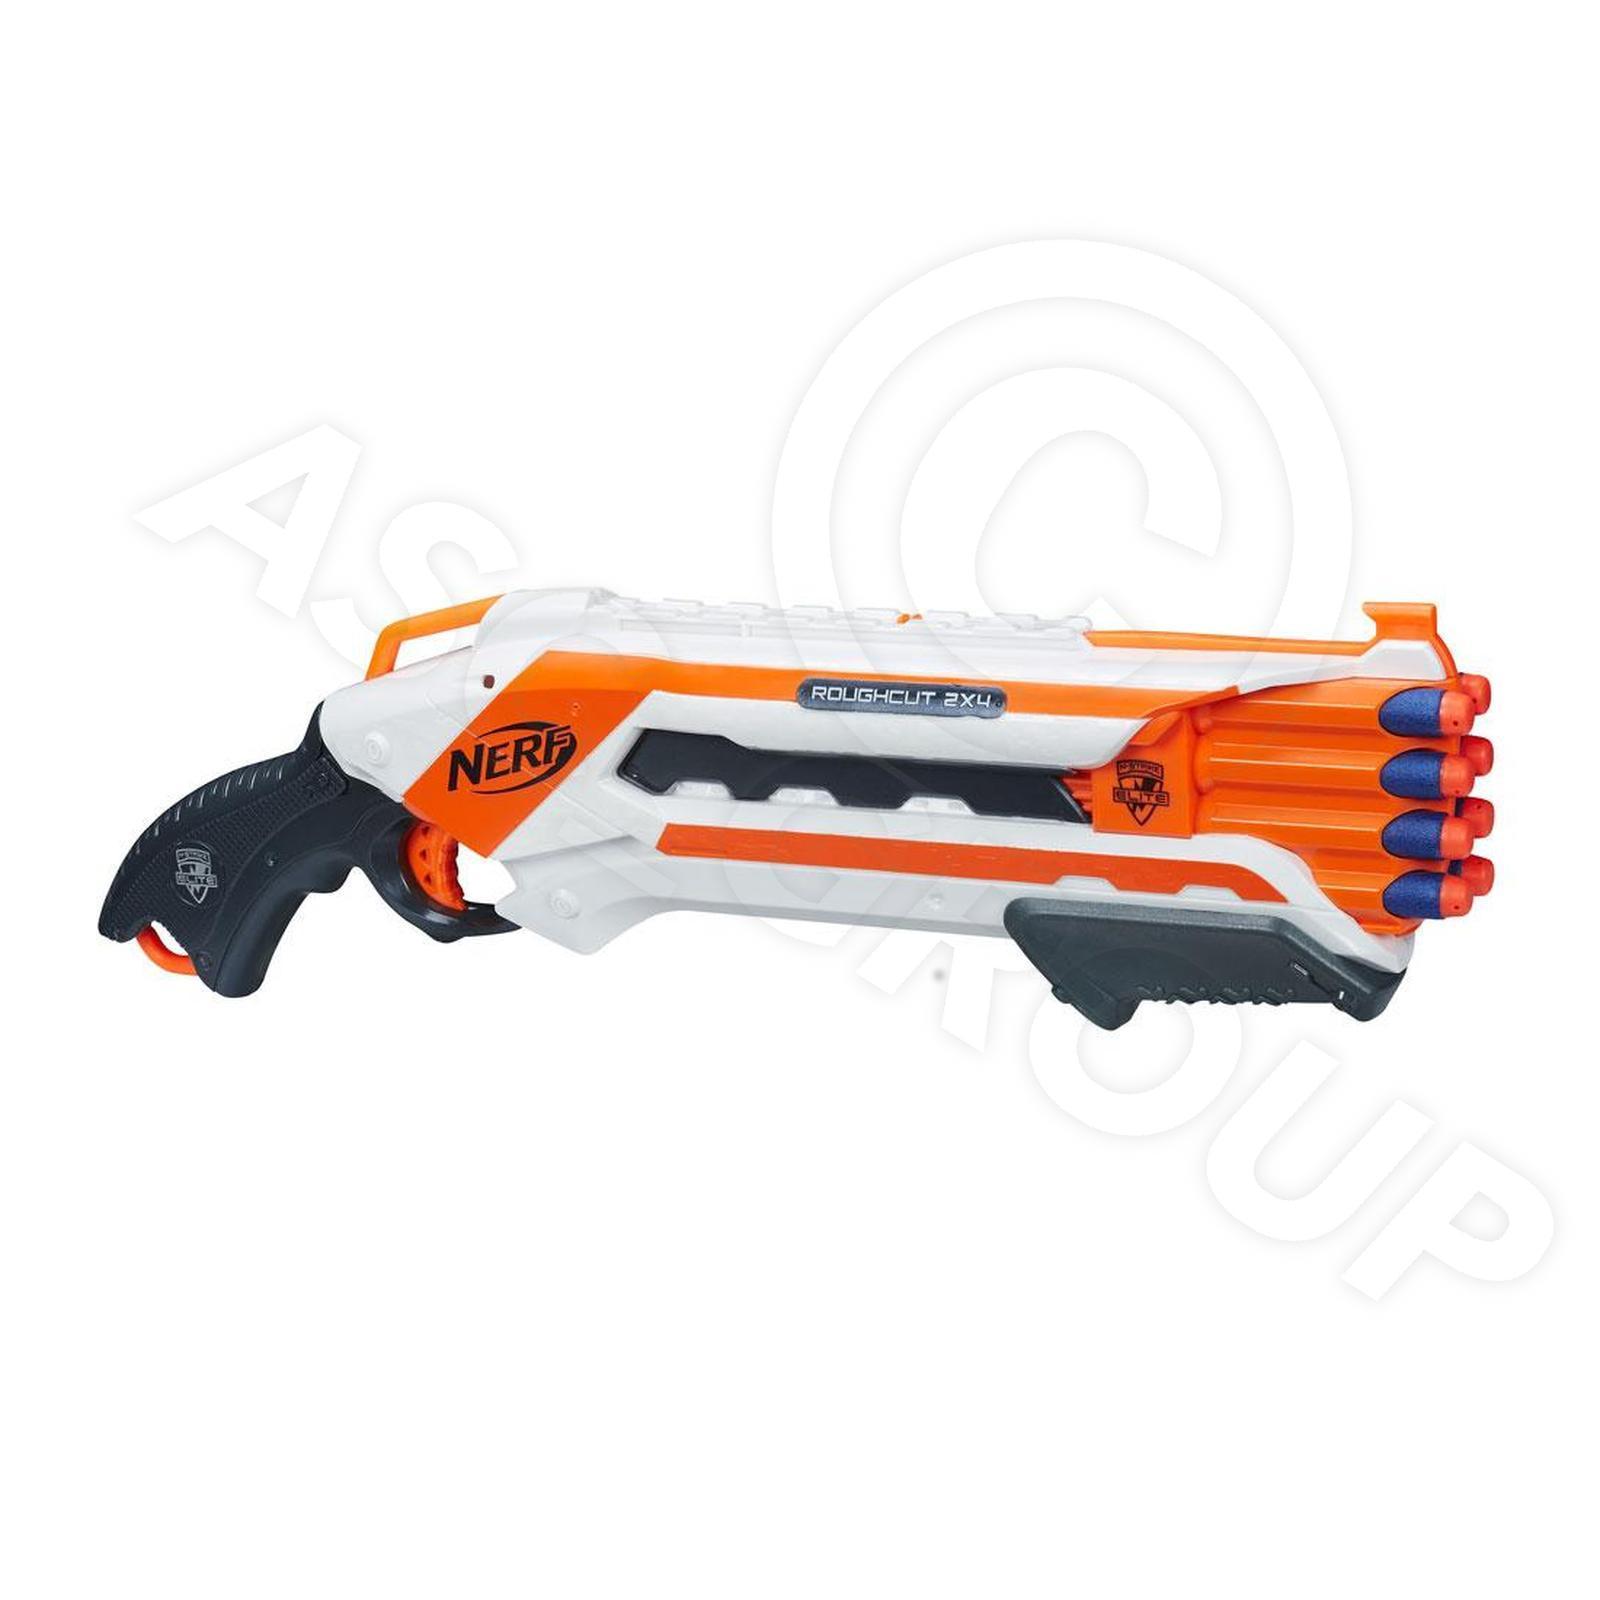 NERF N-STRIKE Elite Rohschnitt 2x4 Blaster / Shotgun & 8 Darts [ Artikel A1691 ]   eBay